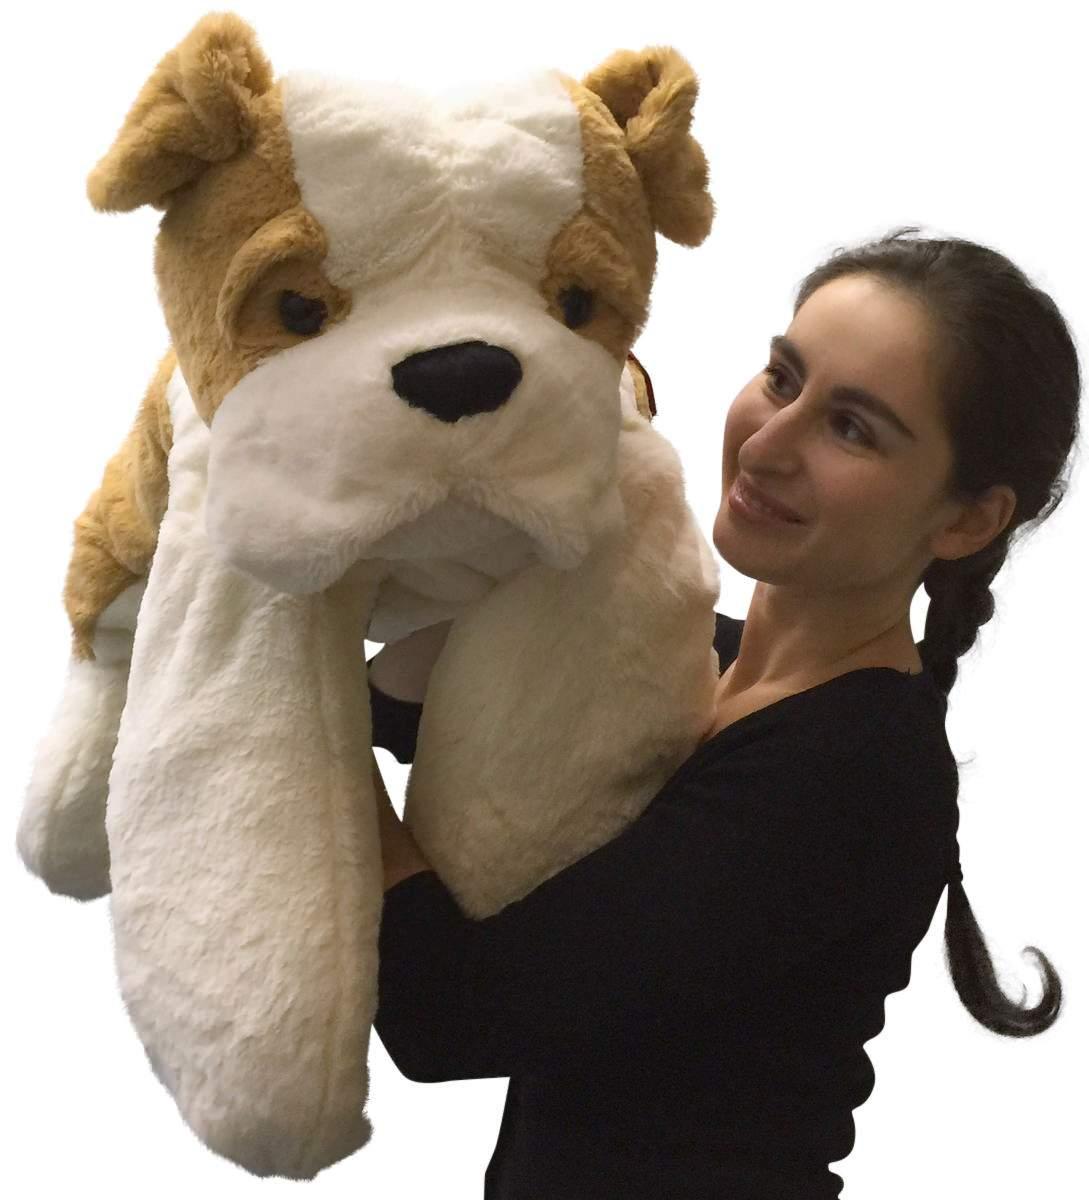 Big Stuffed Bulldog 30 Inches Large Soft Big Plush Dog New Walmart Com